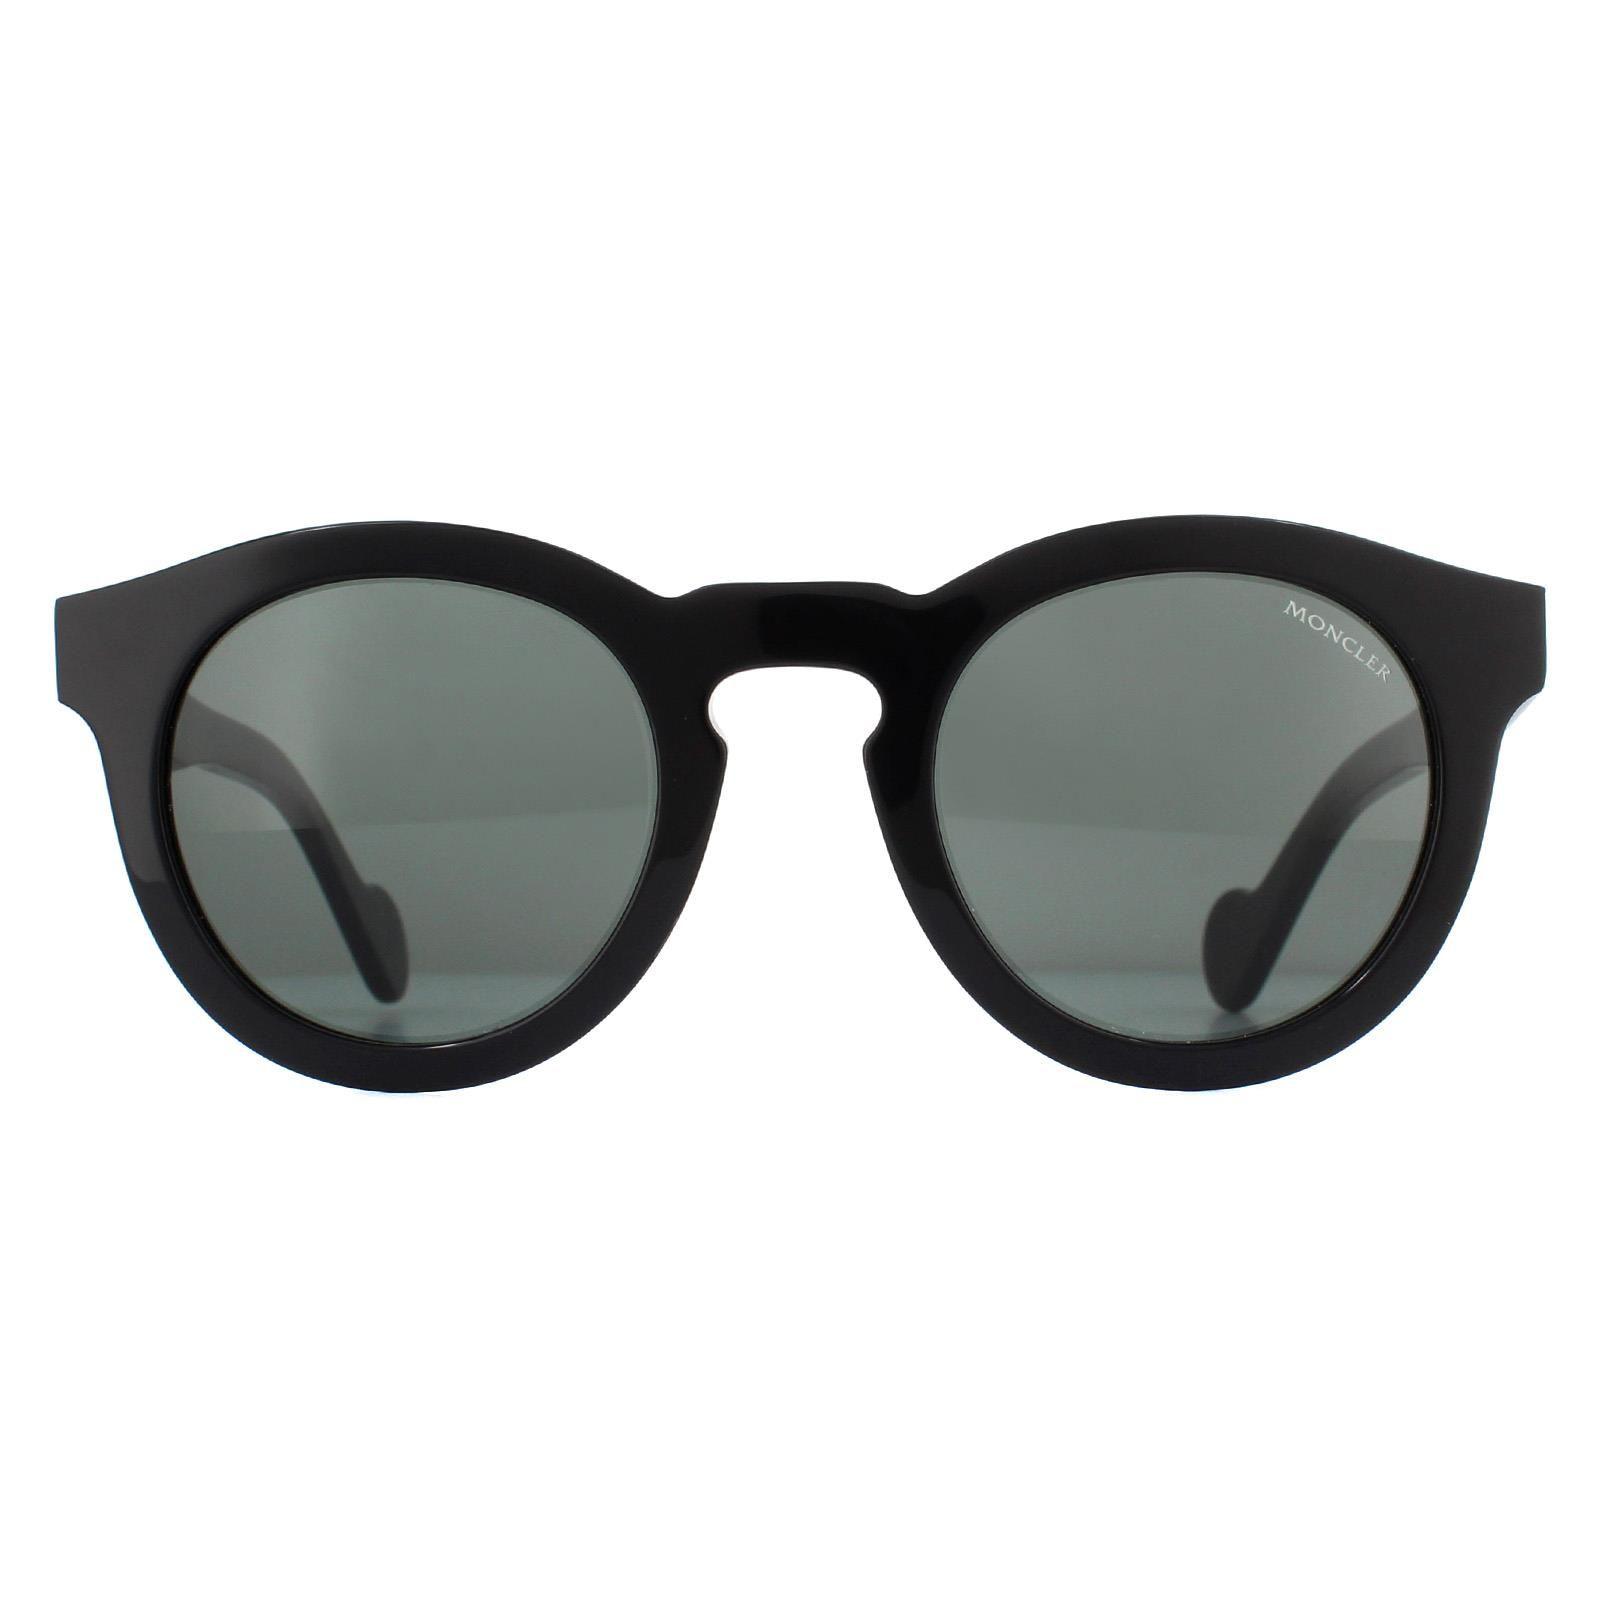 Moncler Sunglasses ML0007 01N Black Green